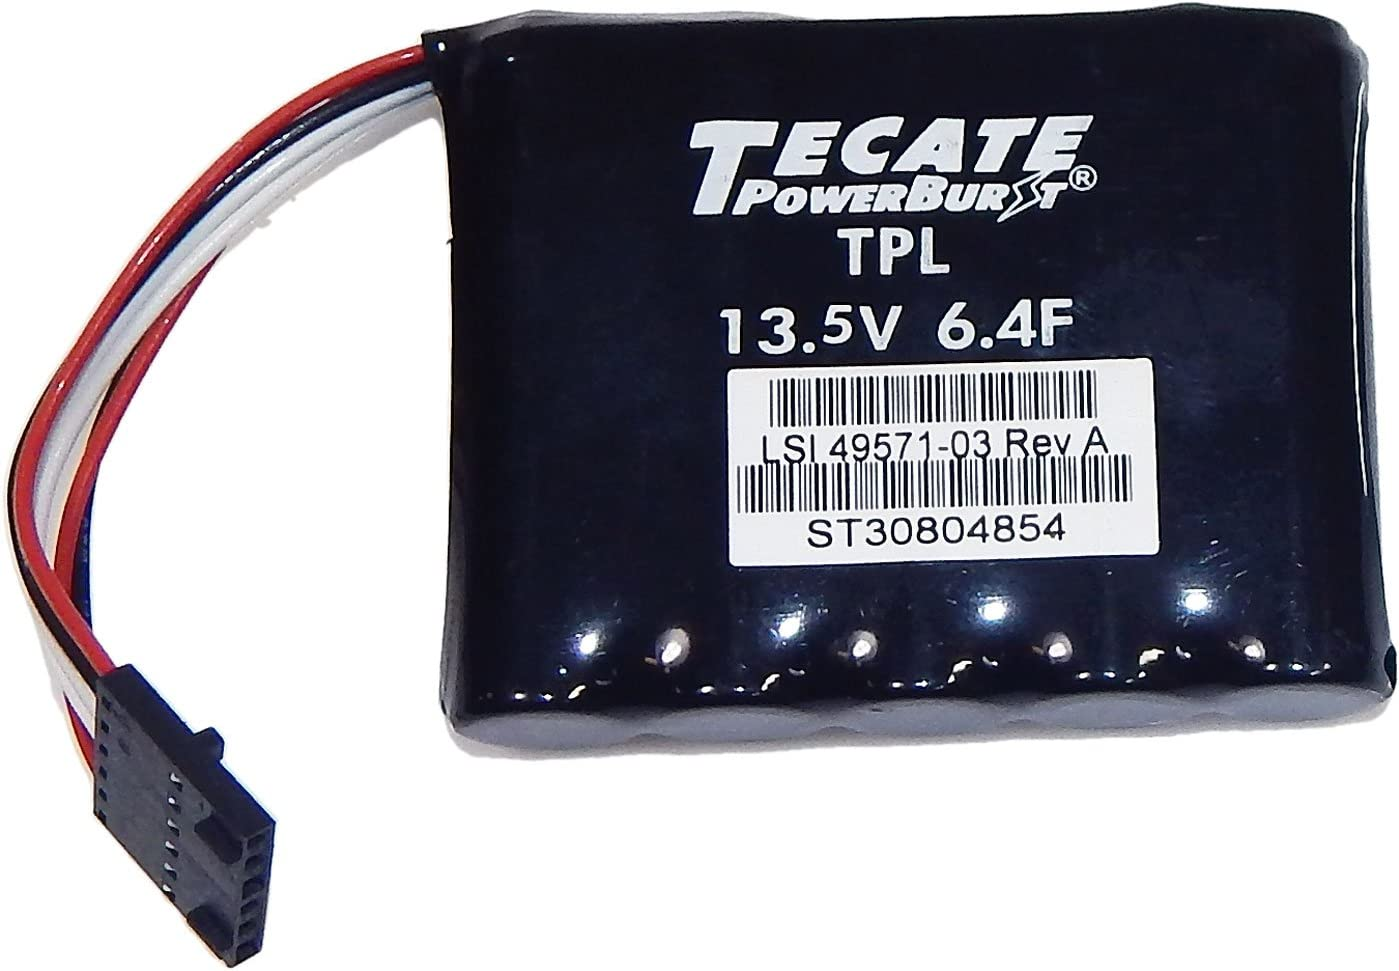 LSI 13.5V 6.4F Raid Cntrl Cap battery Pack 49571-03 Tecate RAID CACHE BBU